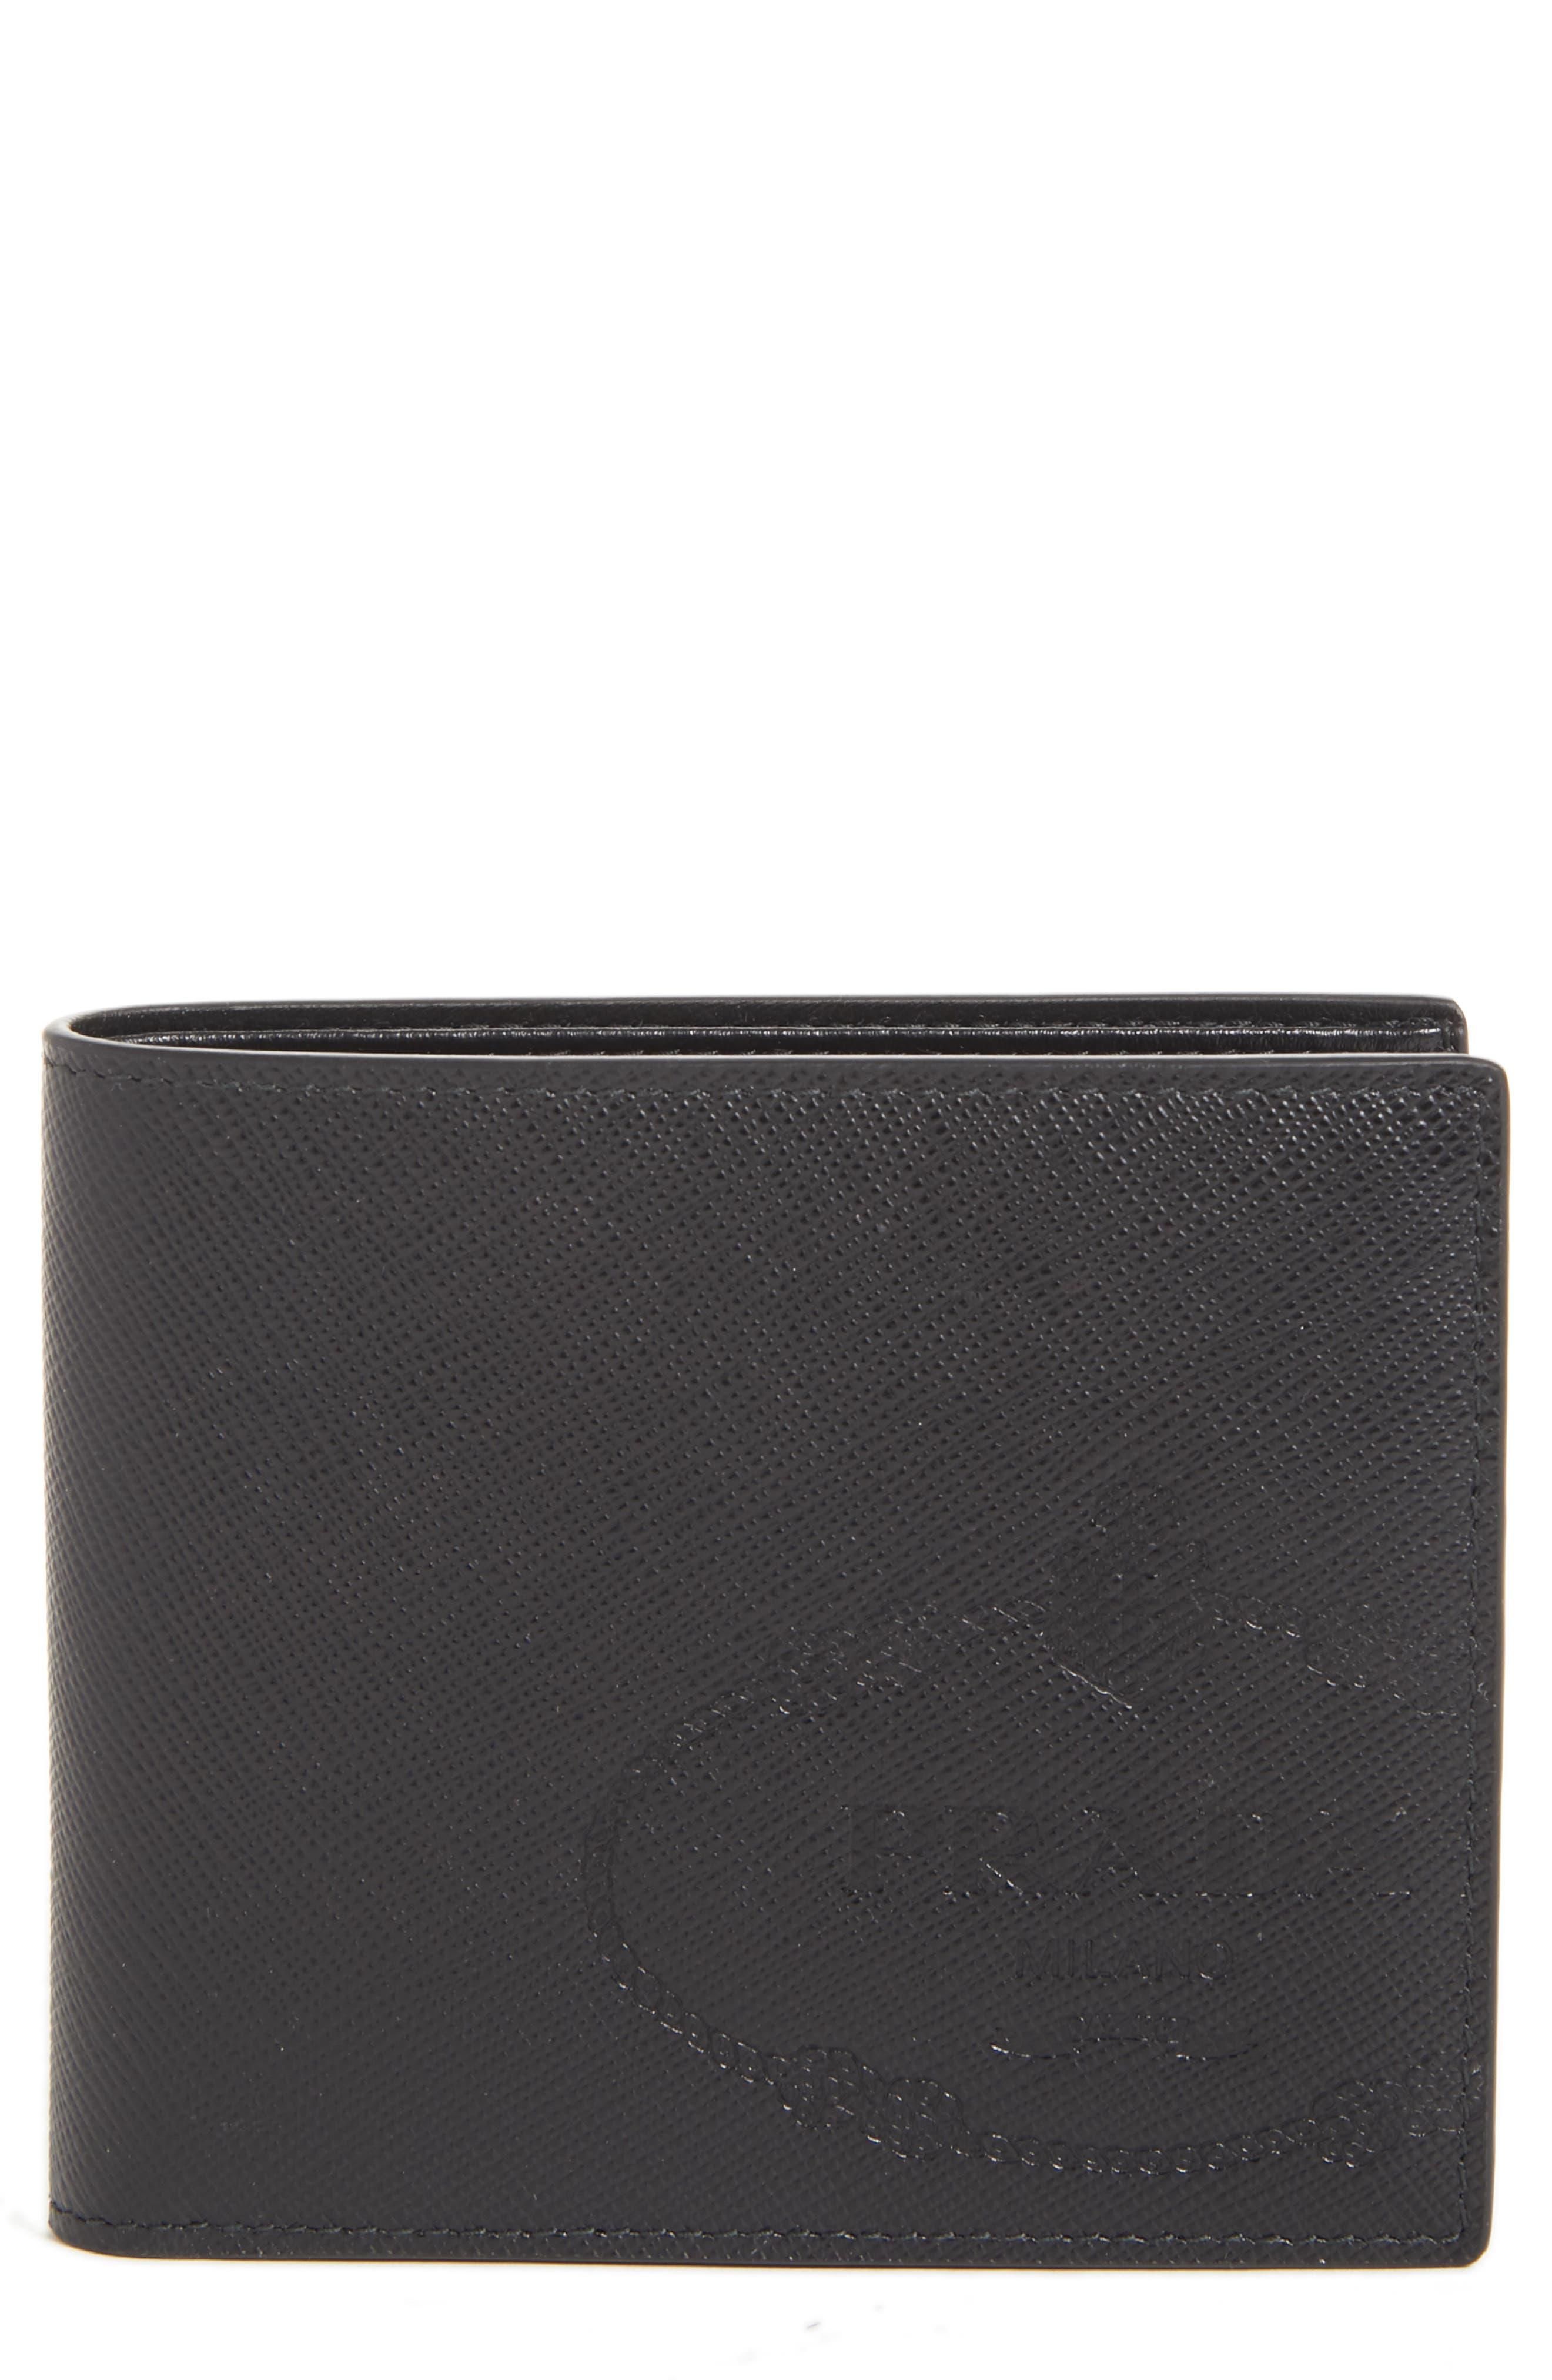 Saffiano Leather Bifold Wallet, Main, color, BLACK